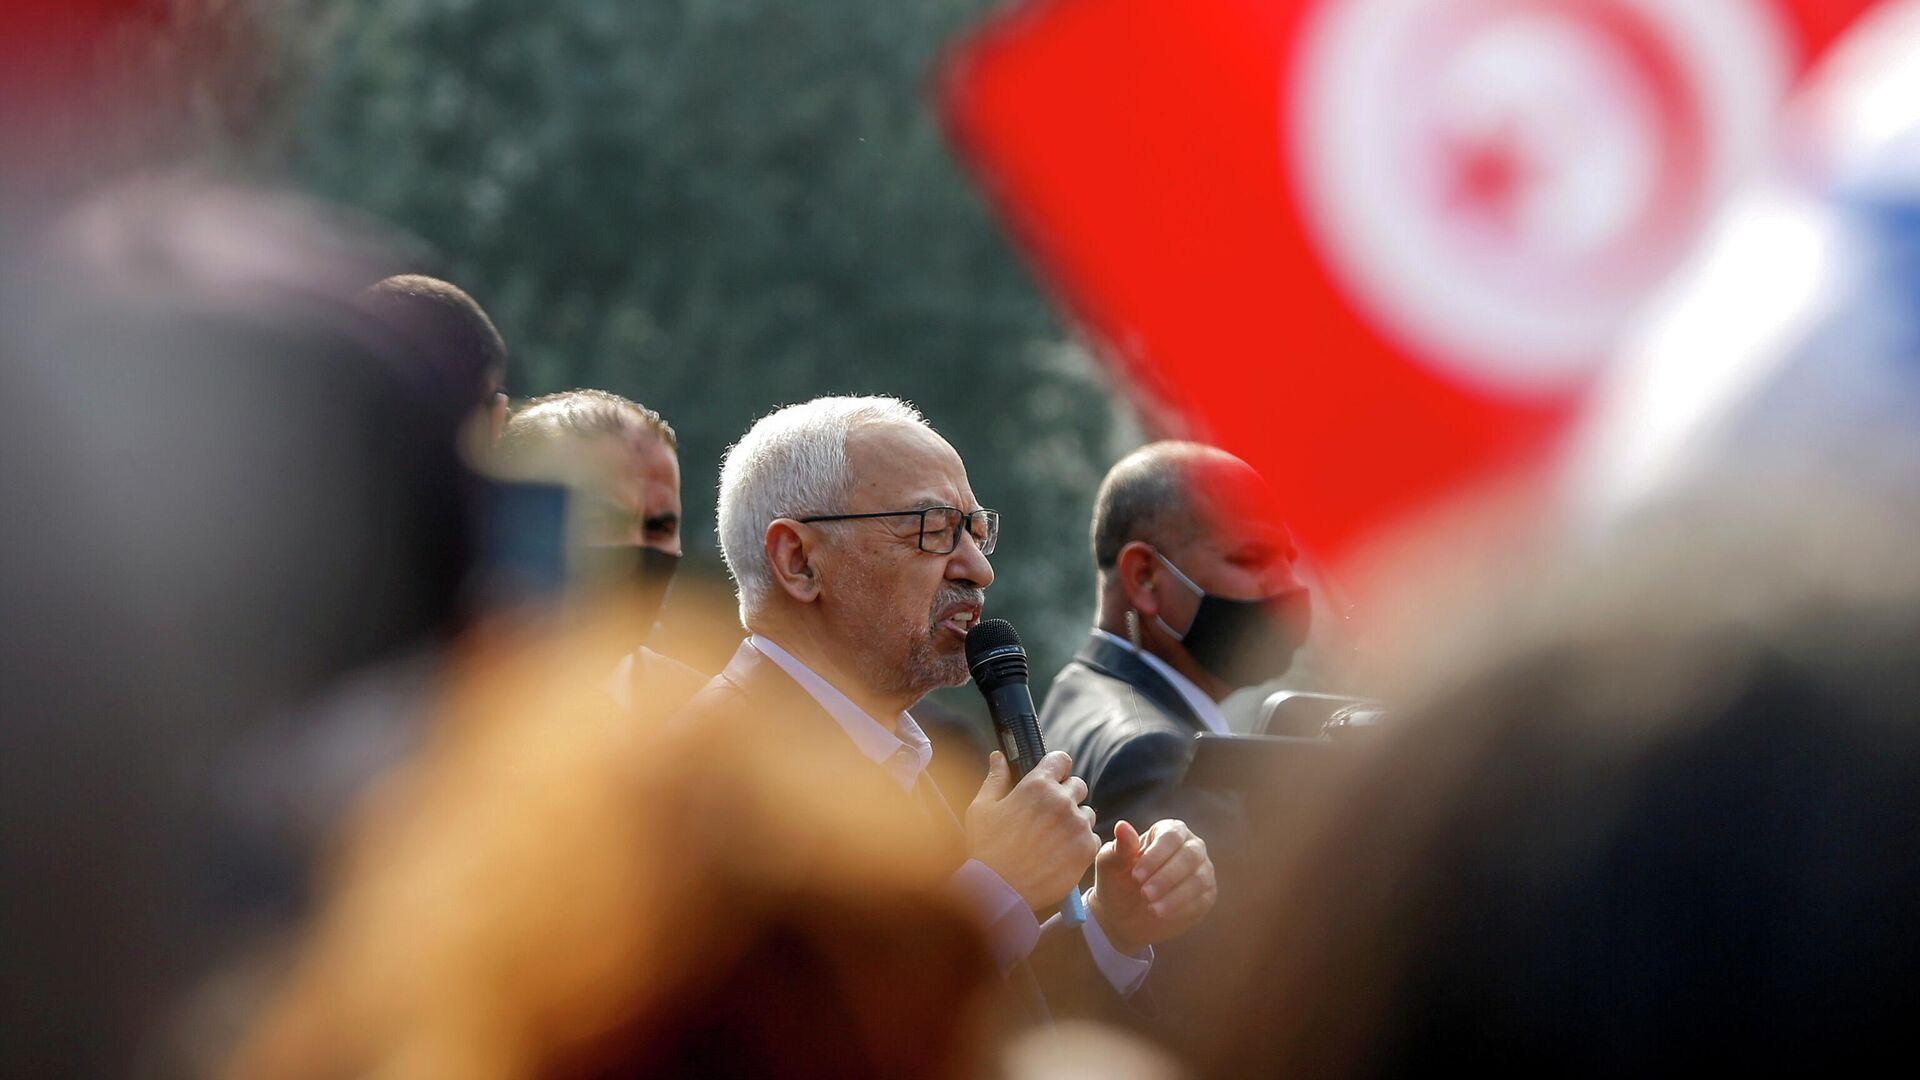 Rached Ghannouchi, portavoz del partido islamista Ennahda - Sputnik Mundo, 1920, 28.07.2021